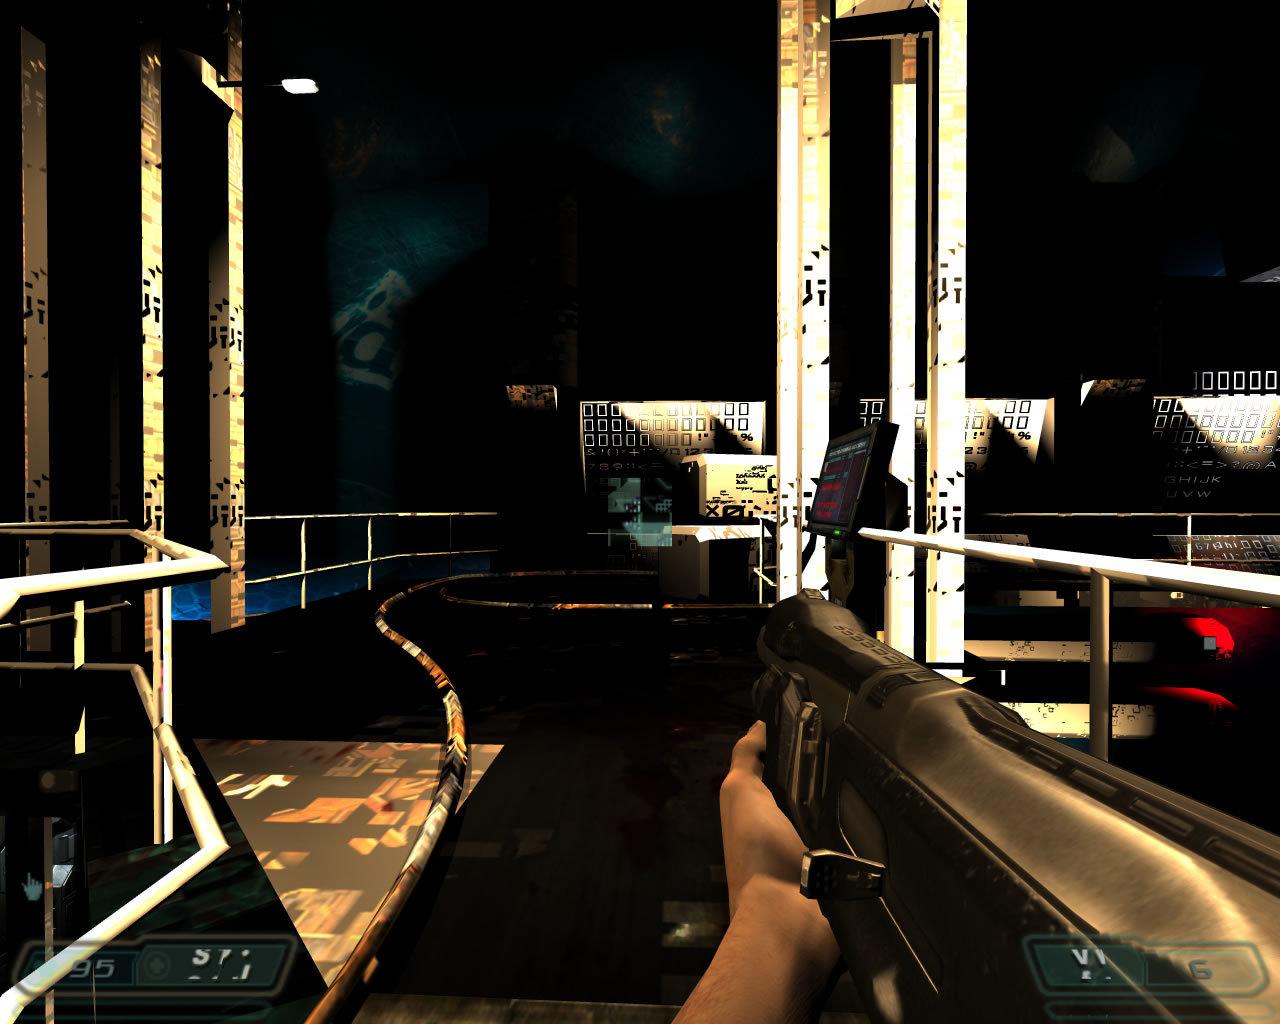 Doom 3 Ultra Quality w/ 16x AA noch mit Grafikfehlern